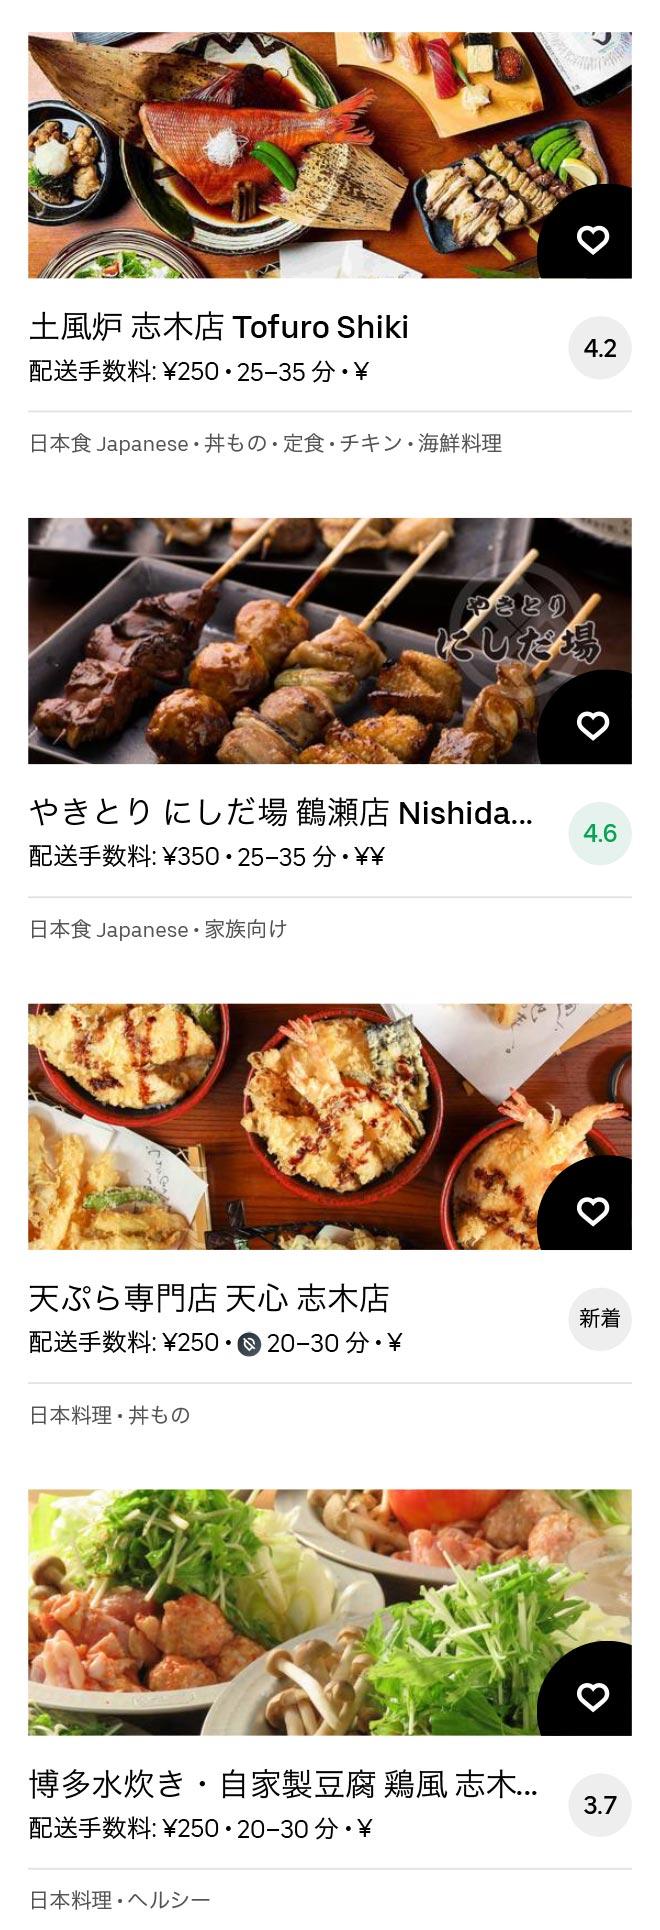 Yanasegawa menu 2011 12